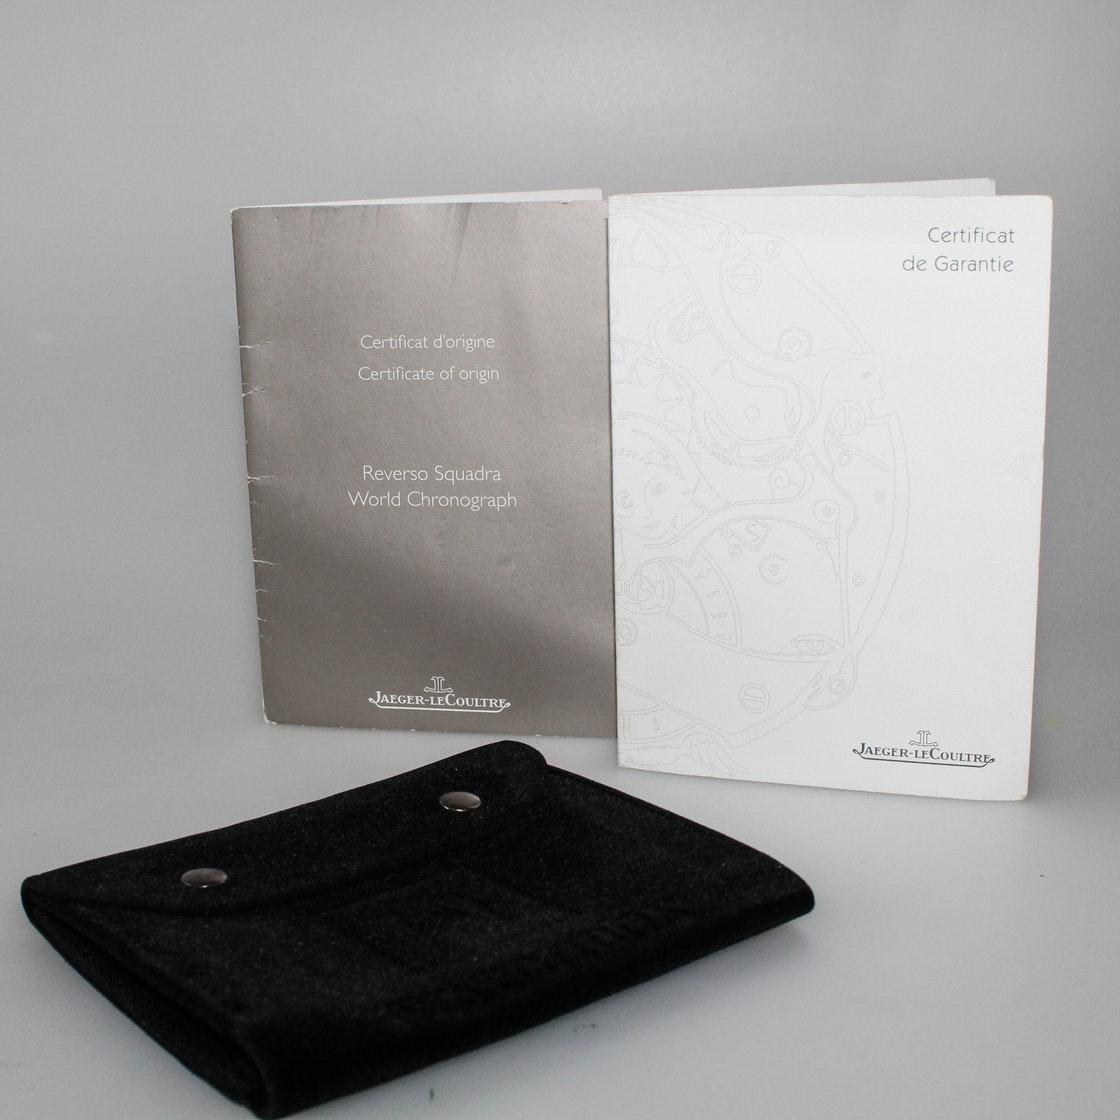 Jaeger-LeCoultre Reverso Squadra World Chronograph Limited Edition Q702T470